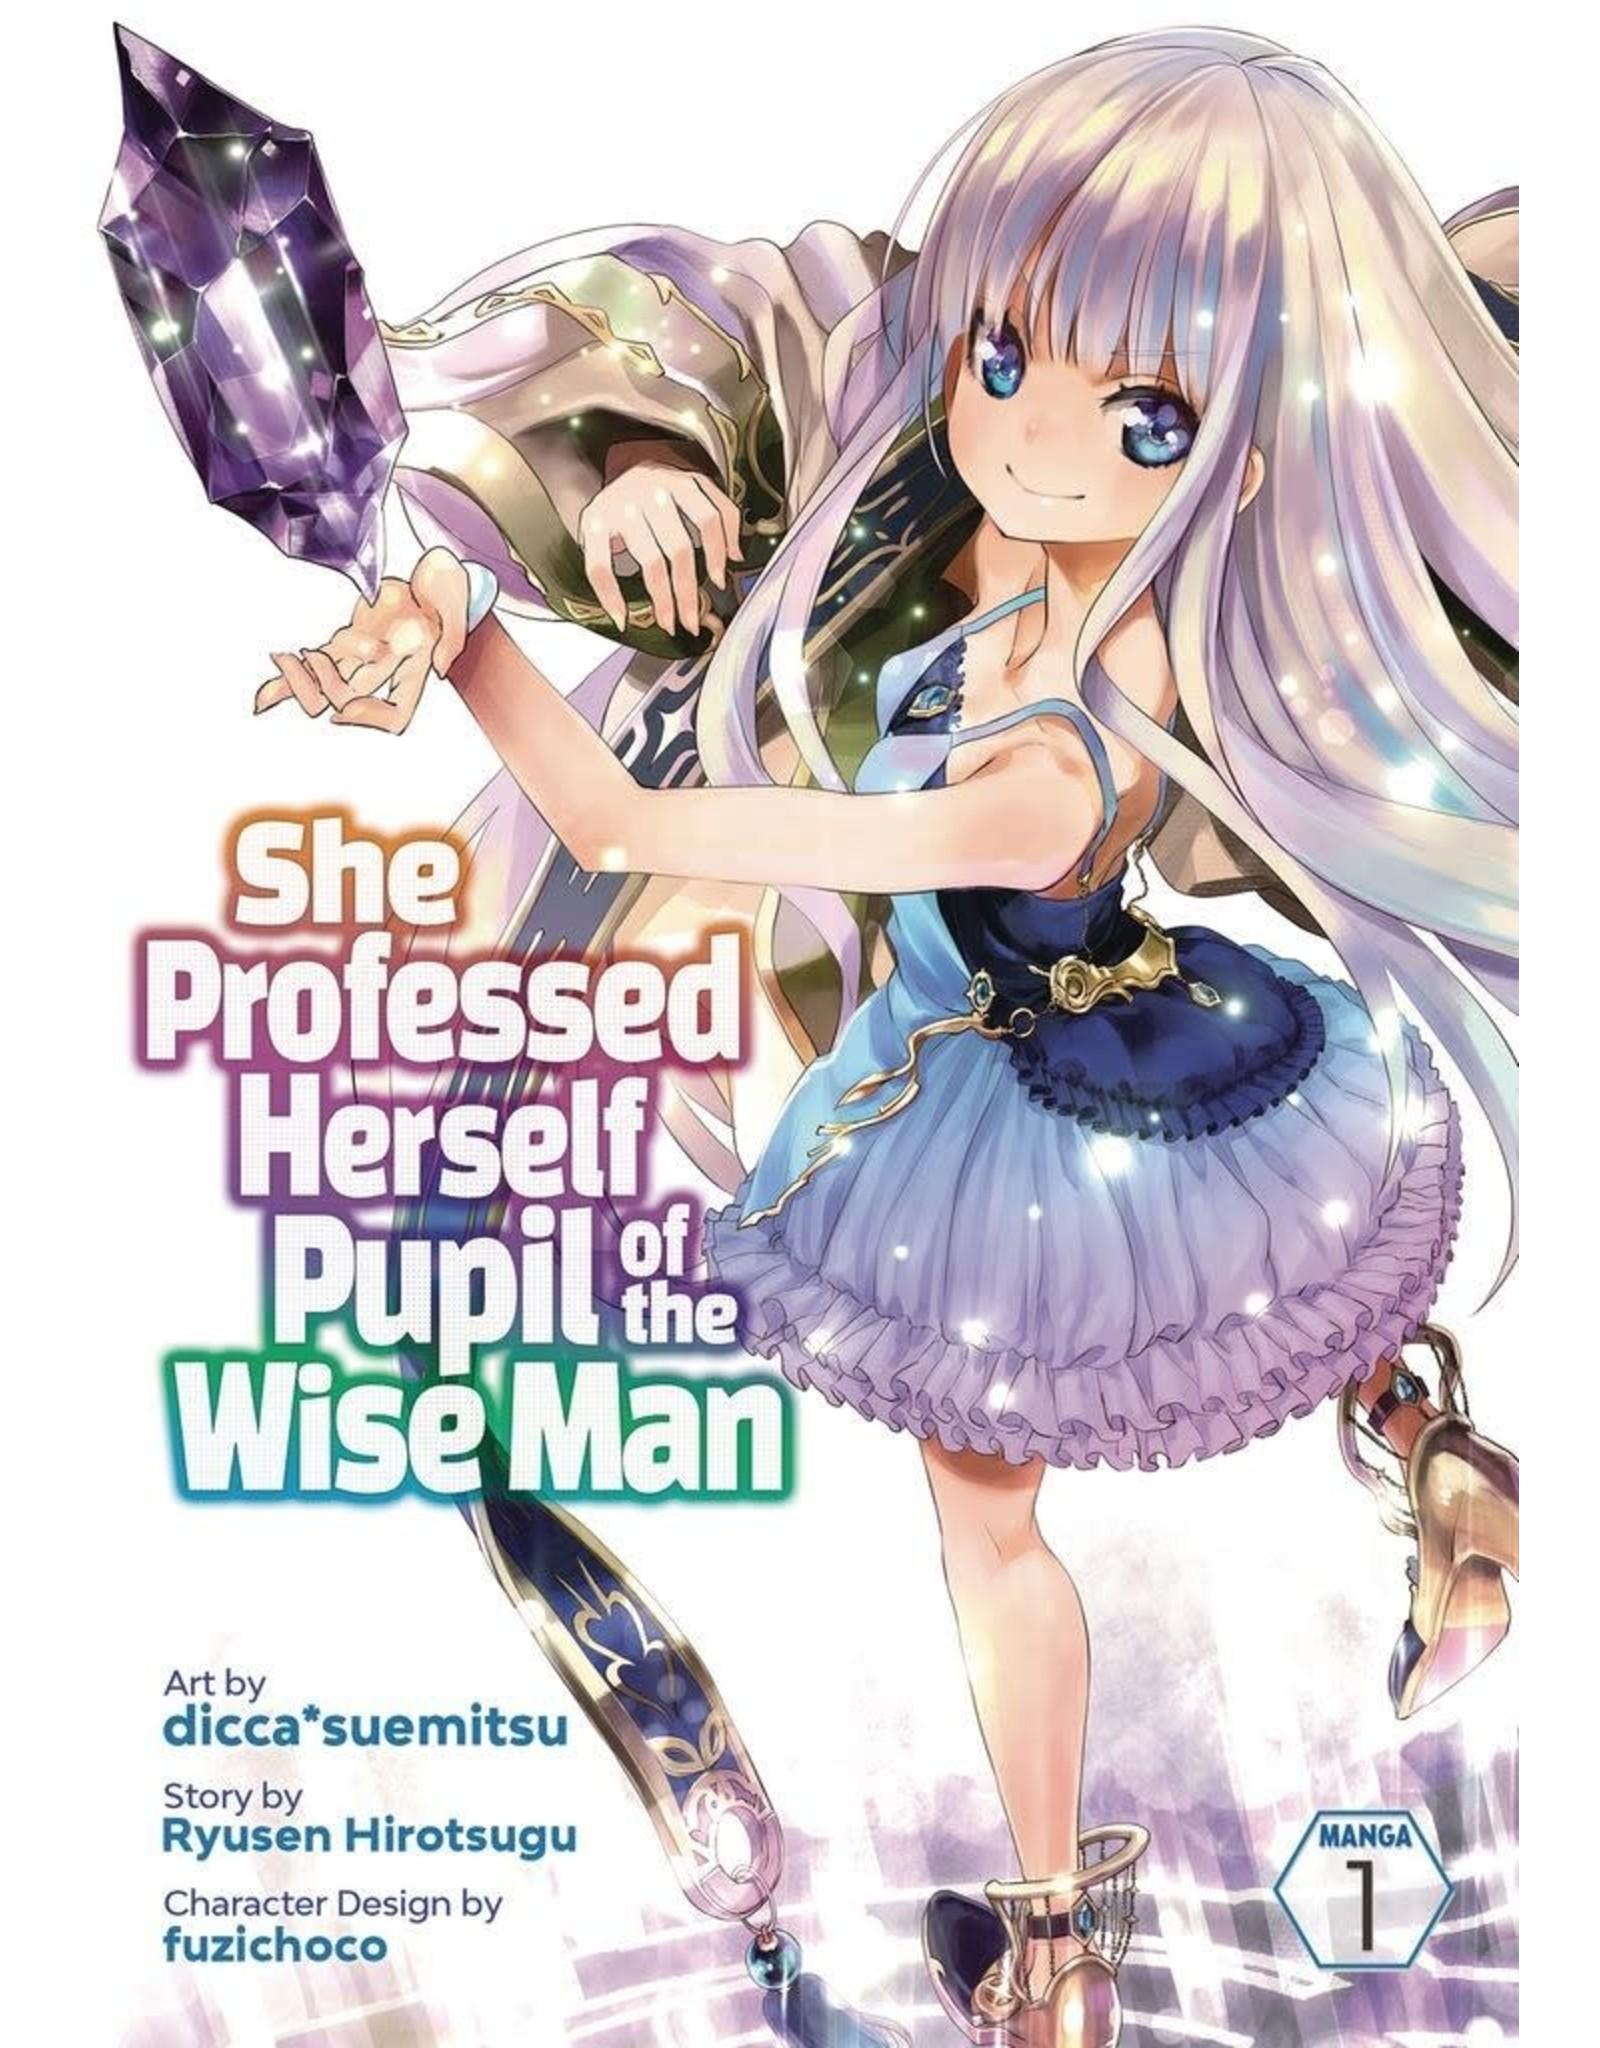 She Professed Herself Pupil Of The Wise Man (Engelstalig) - Manga